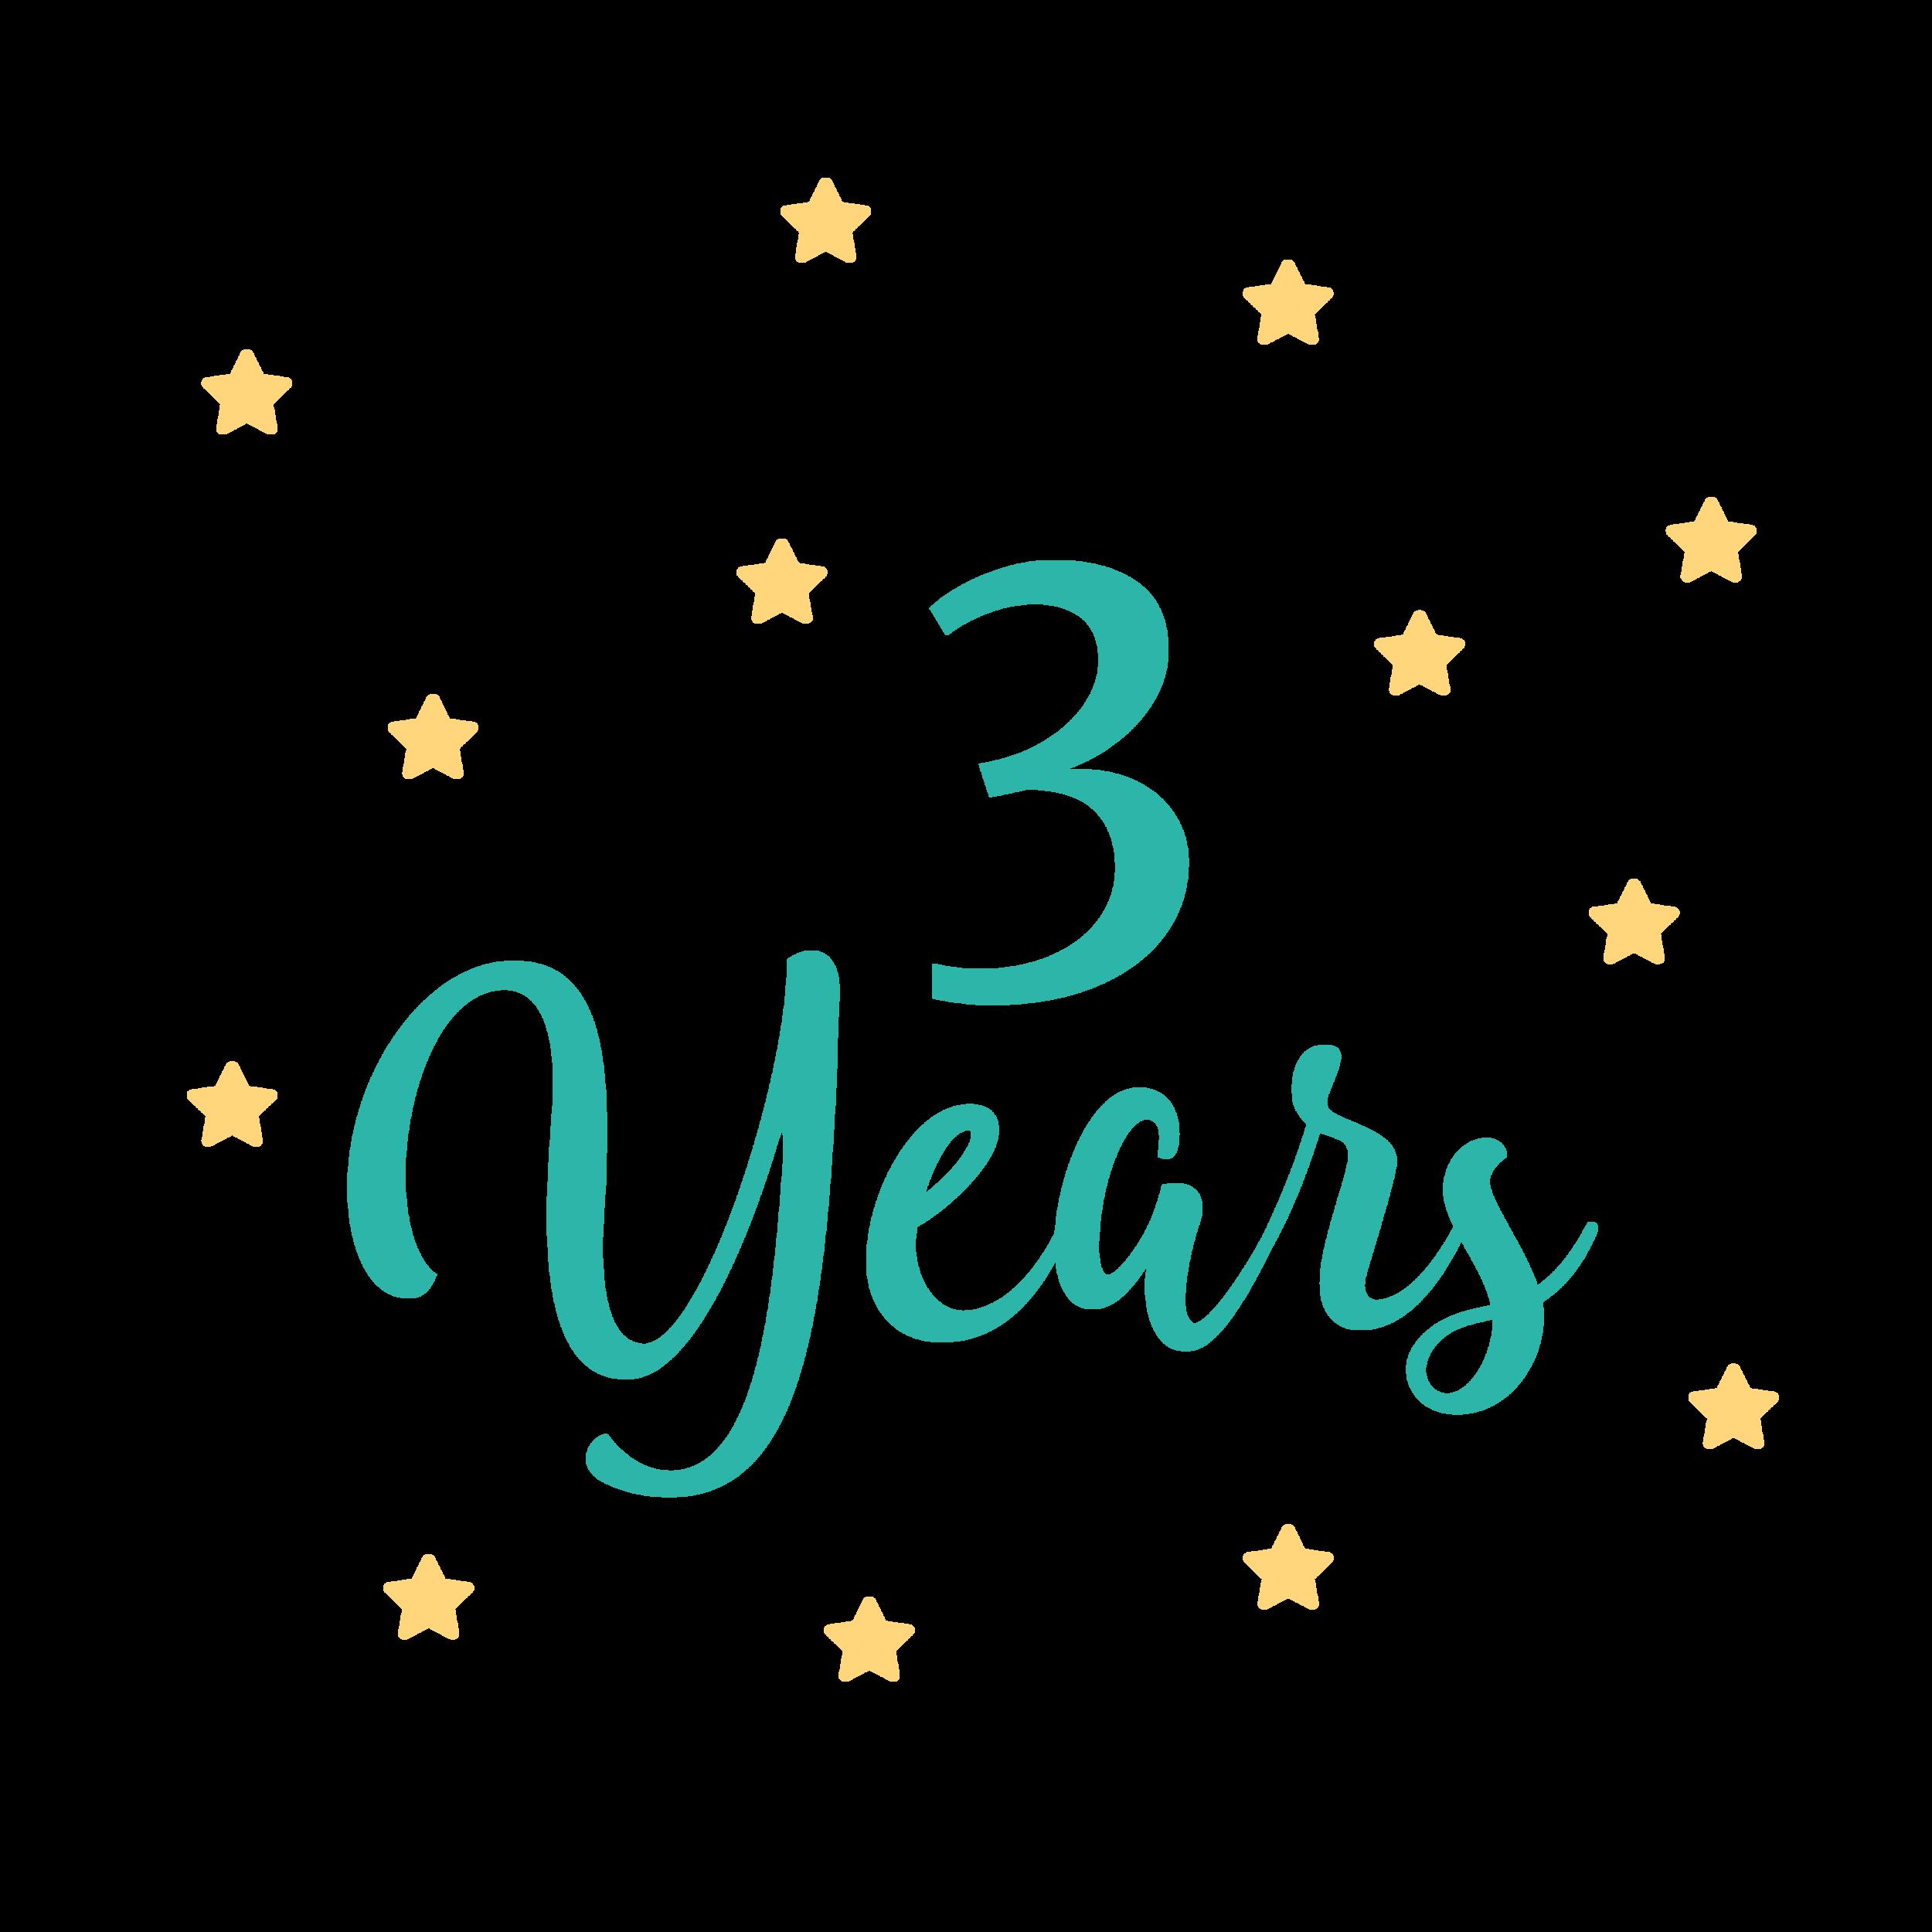 3 Year Visit - 3 years packet (PDF)